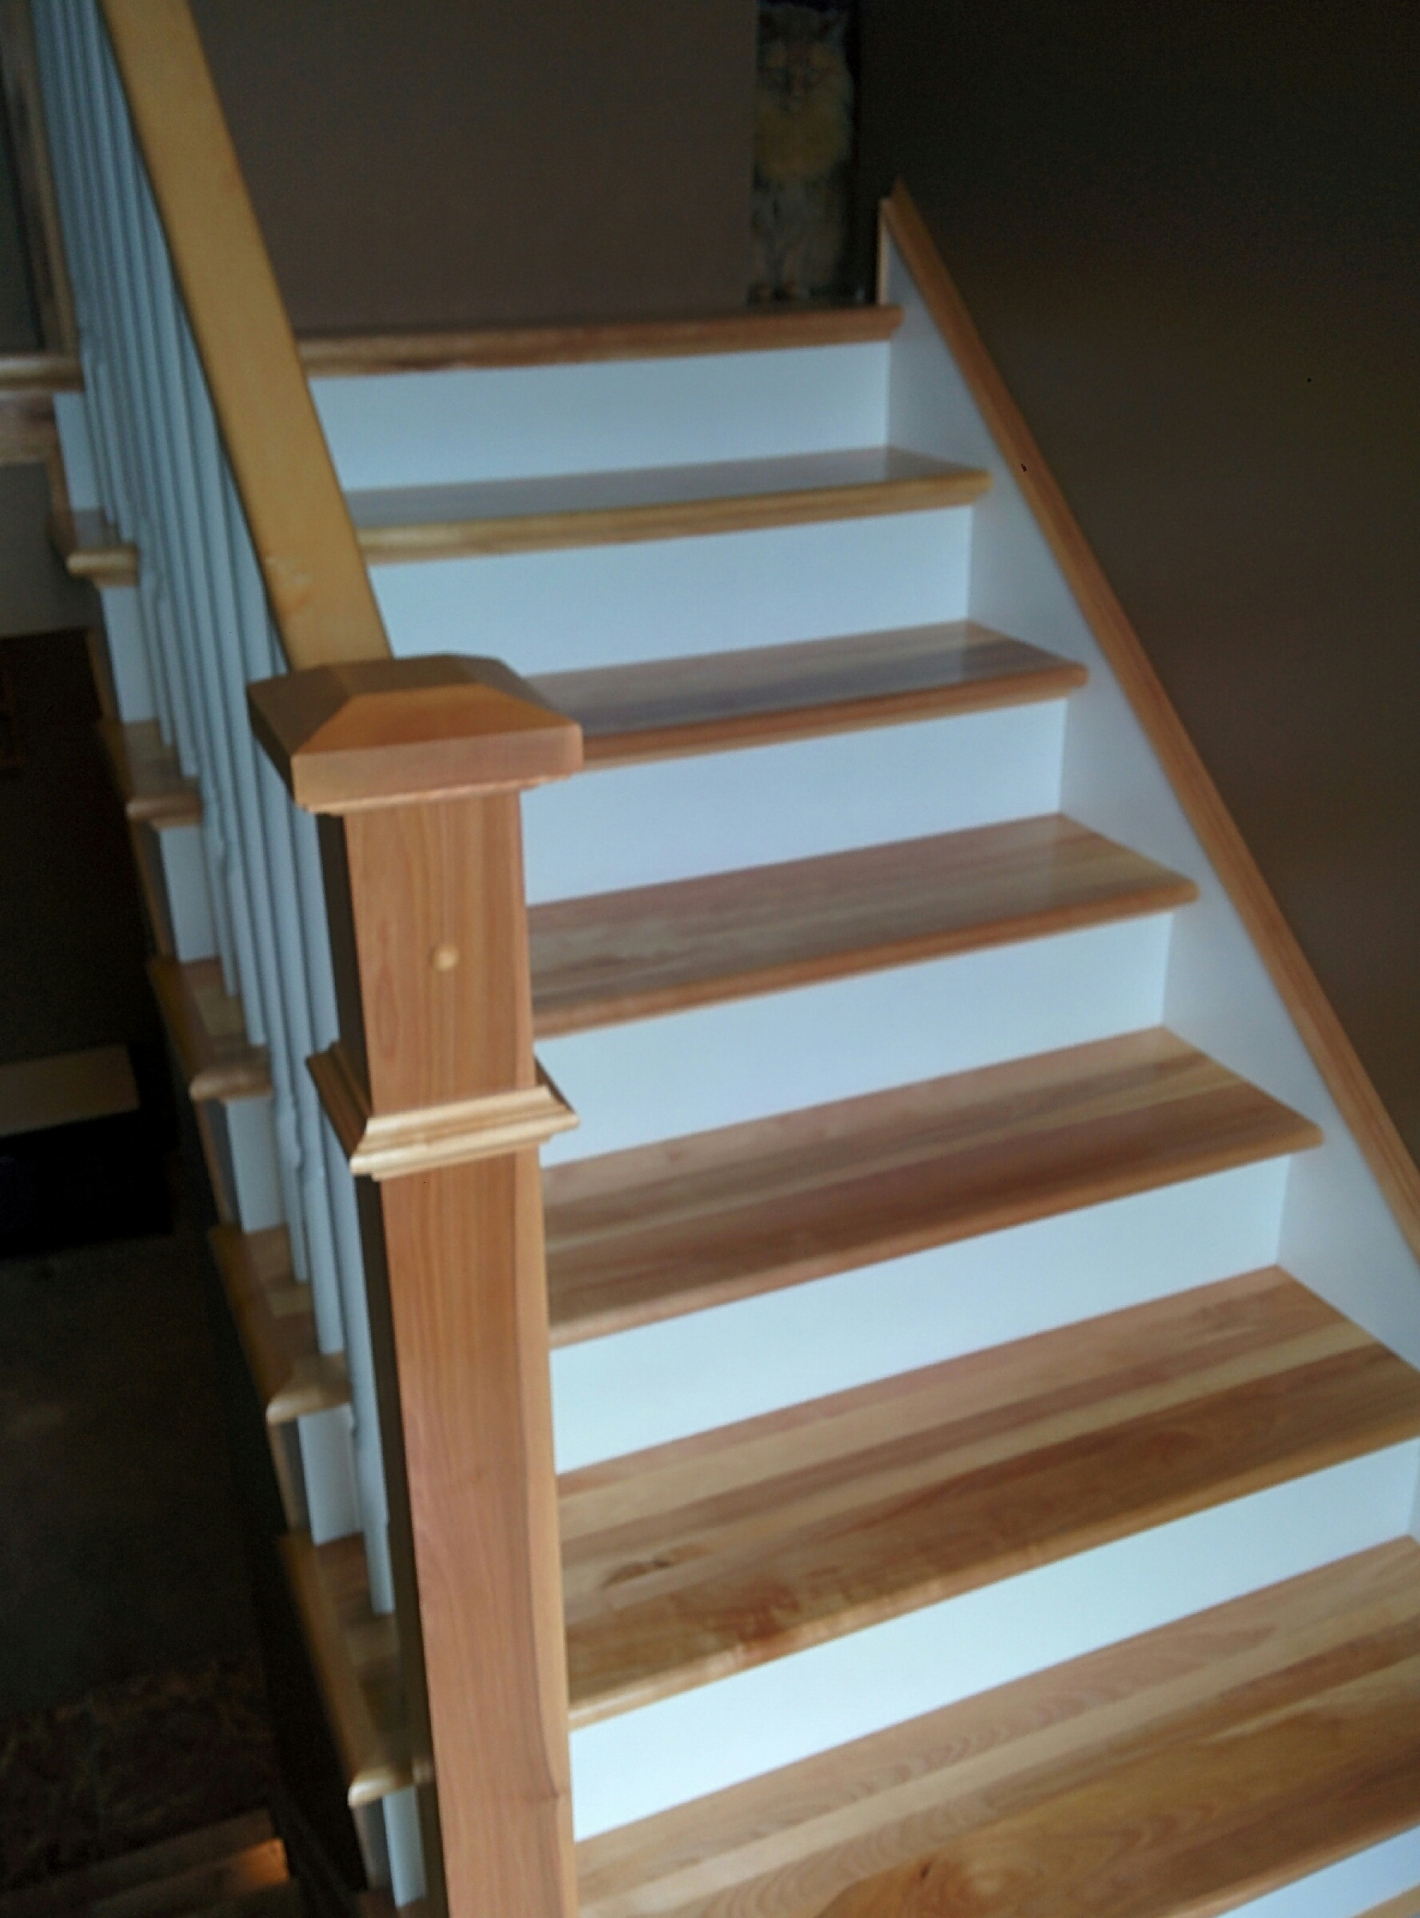 Newel Posts Scotia Stairs Ltd